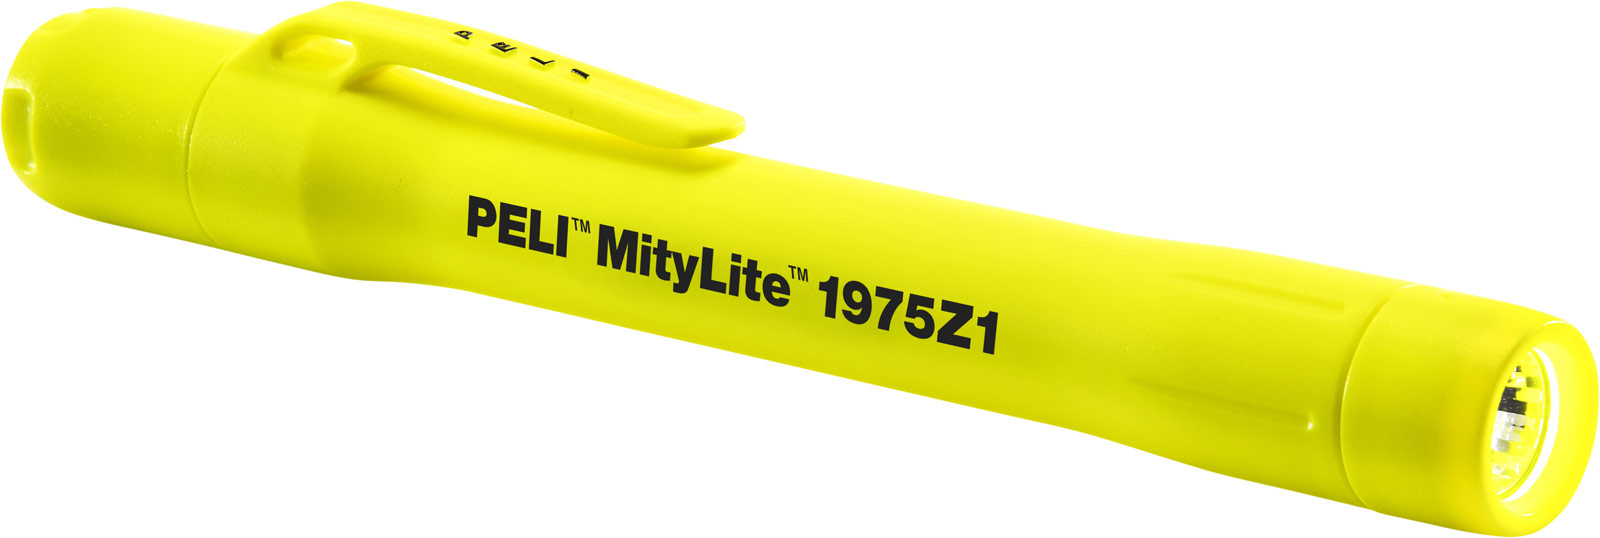 peli mitylite 1975z1 flashlight